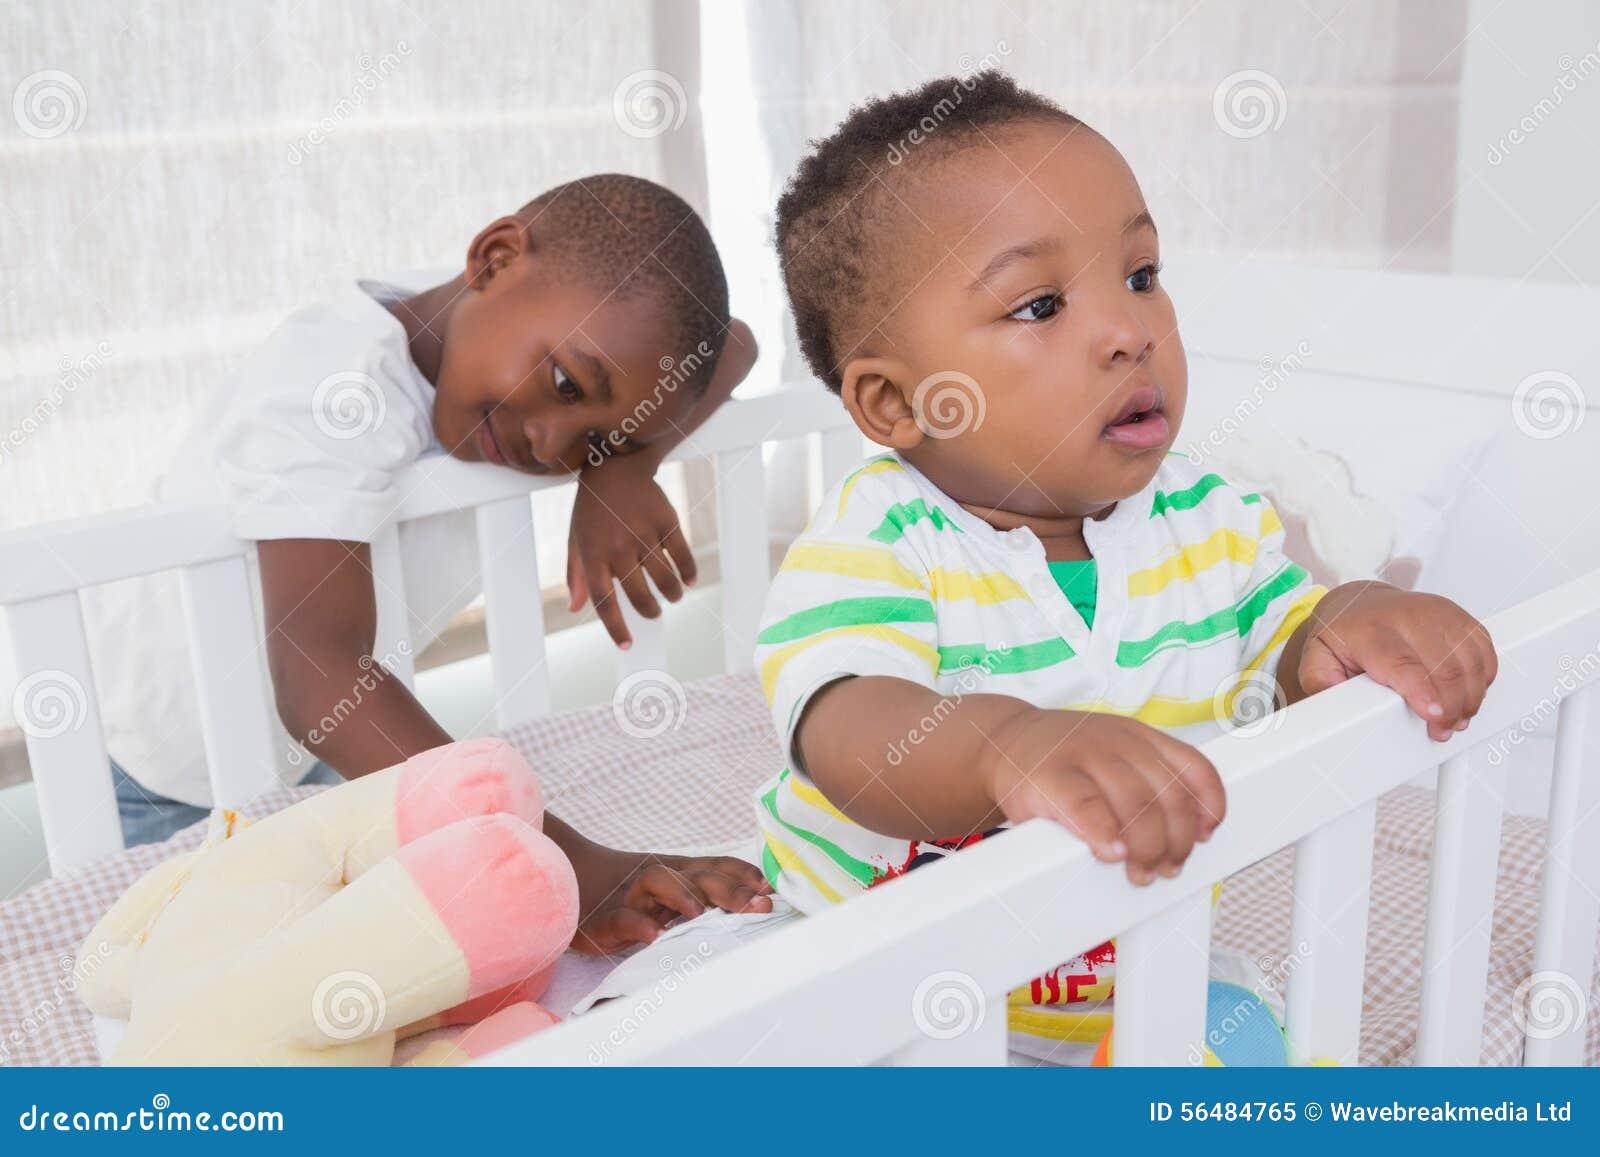 Babyboy et son frère dans le babyroom